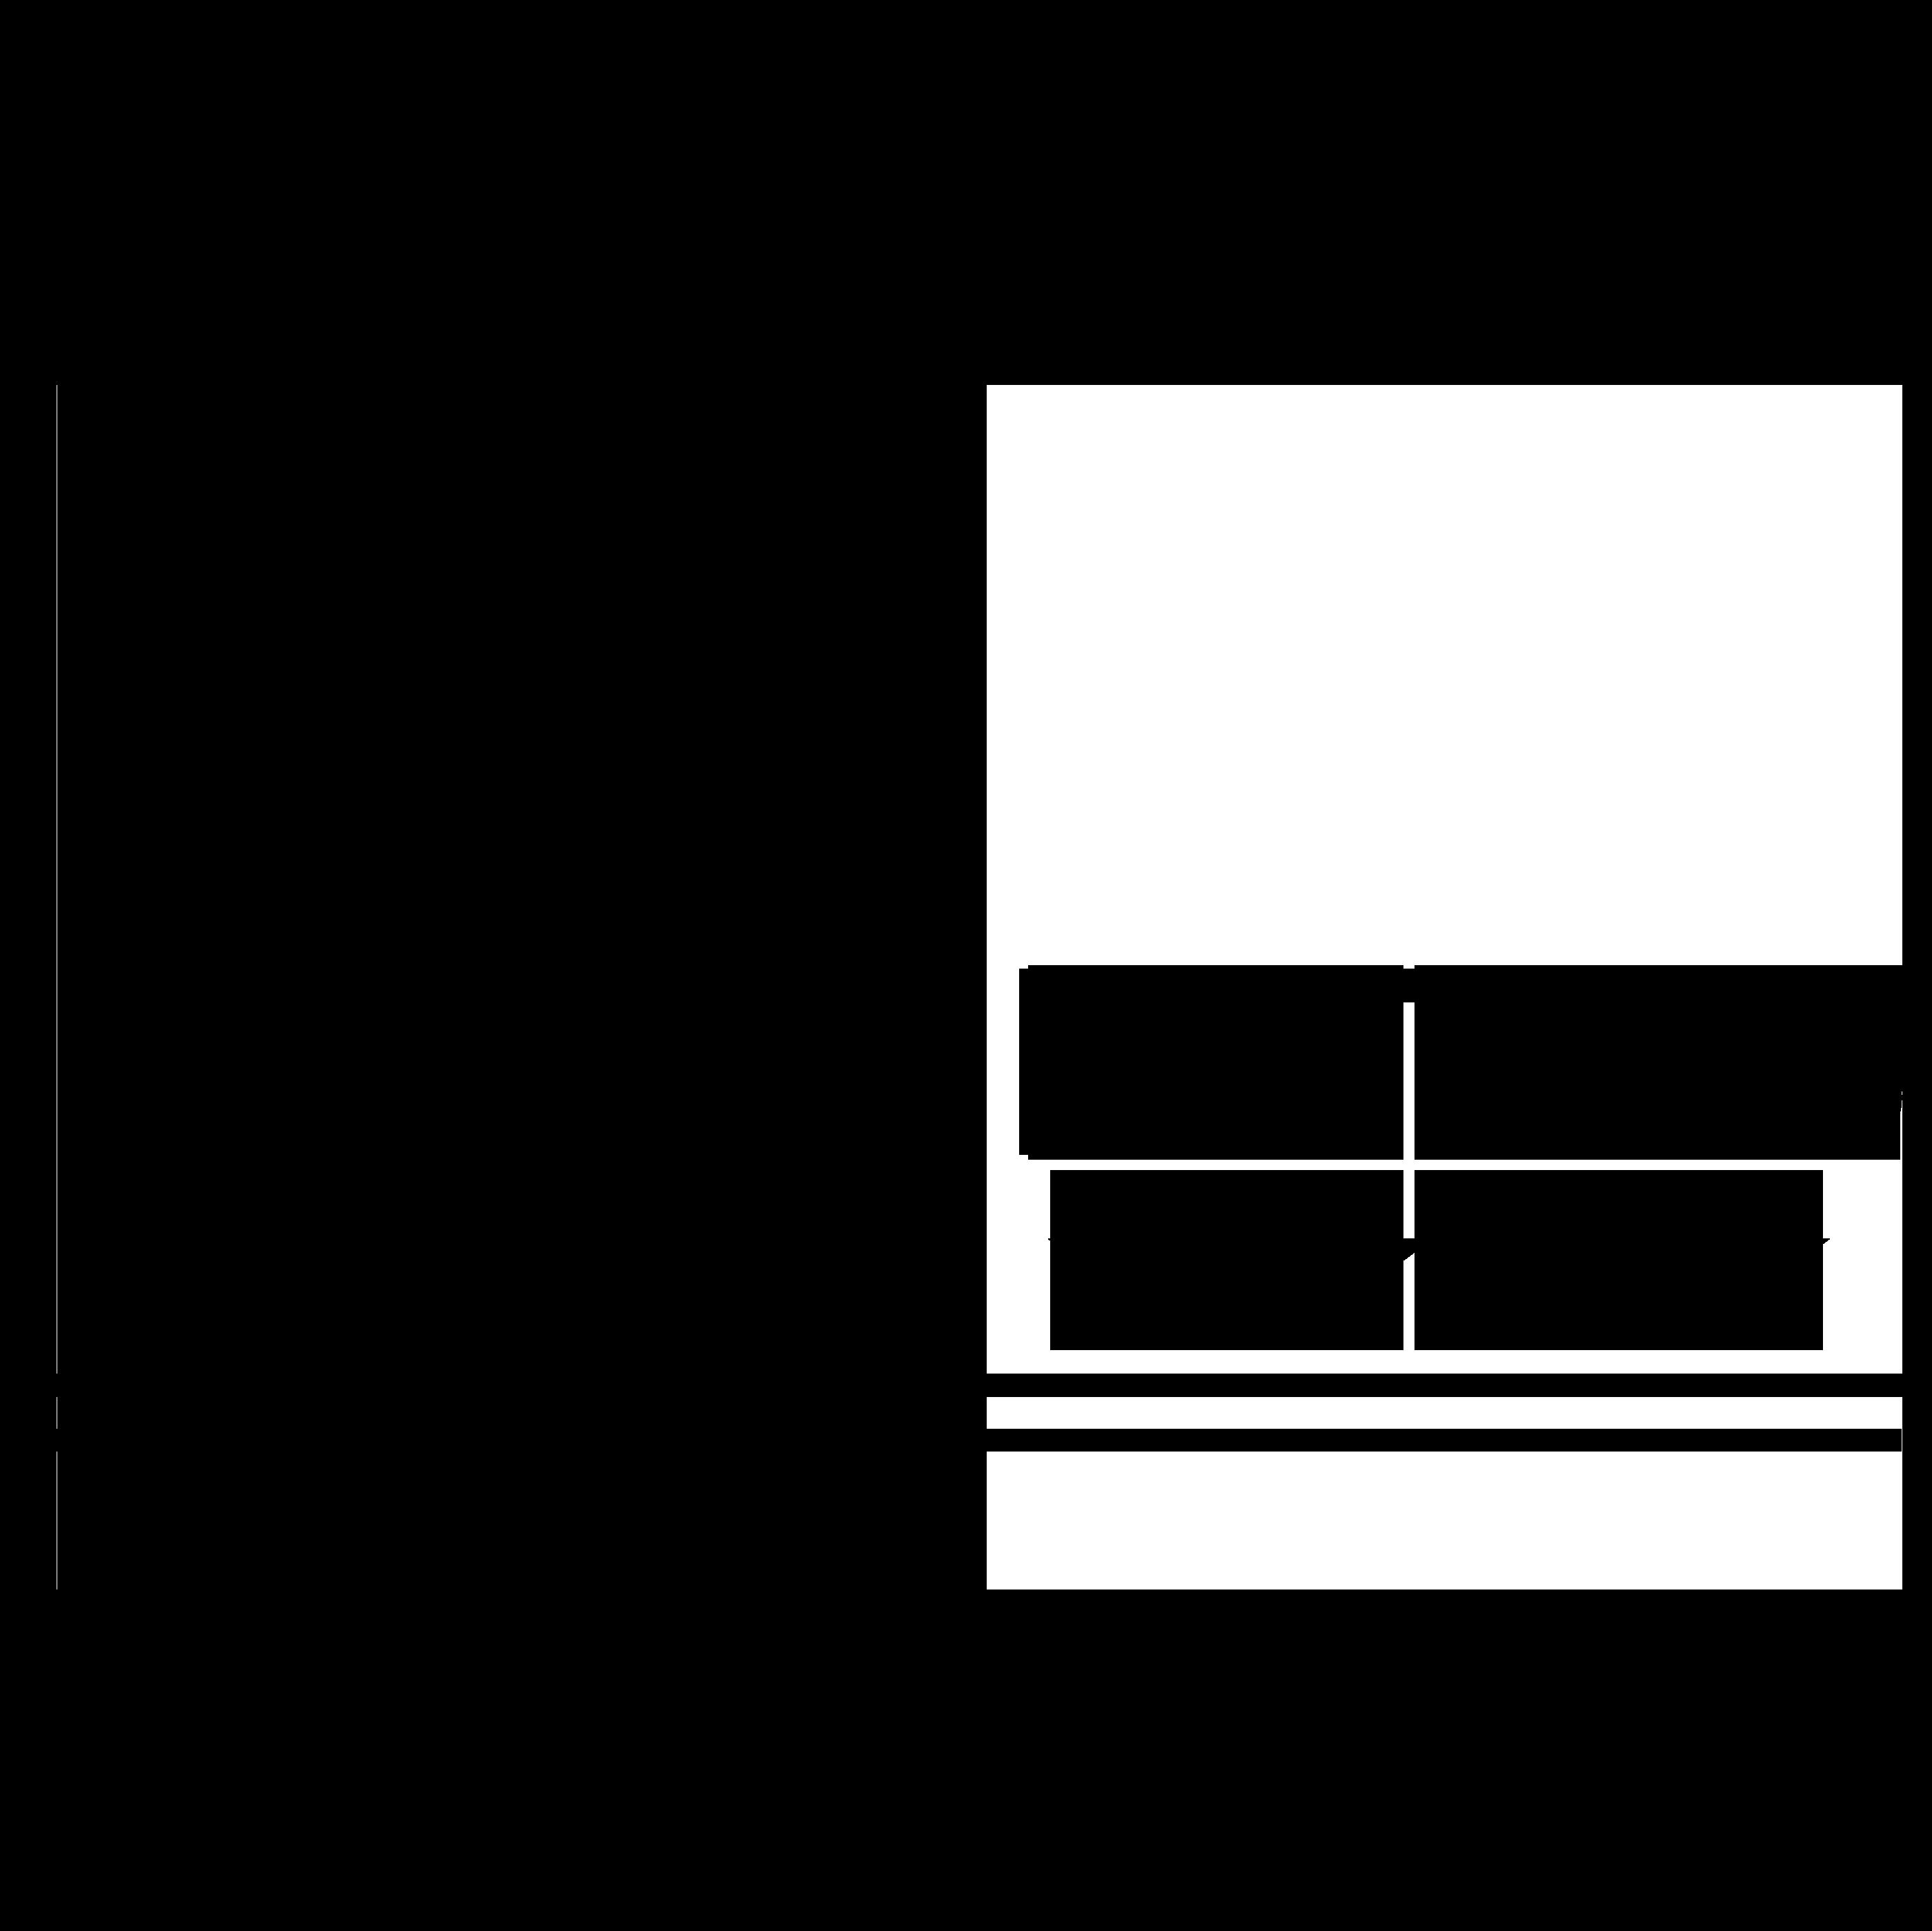 sv-hotel-with-stars-logo